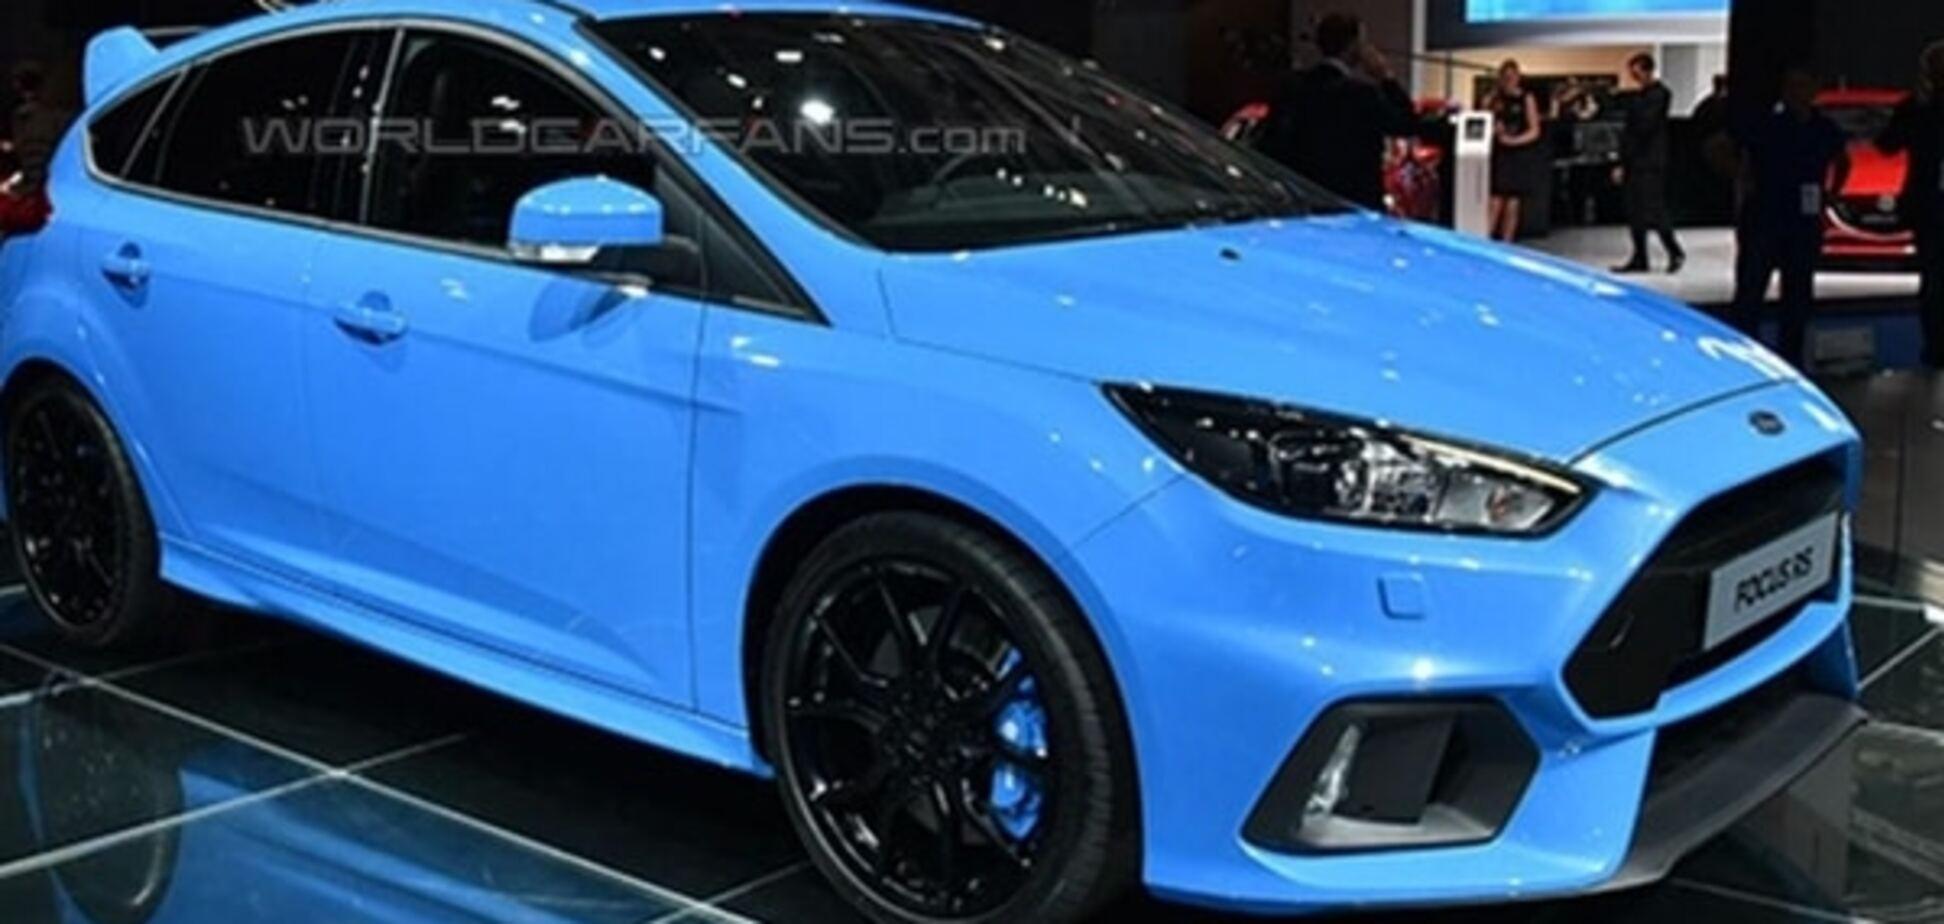 Франкфуртский автосалон: Ford огласил характеристики своей самой быстрой модели